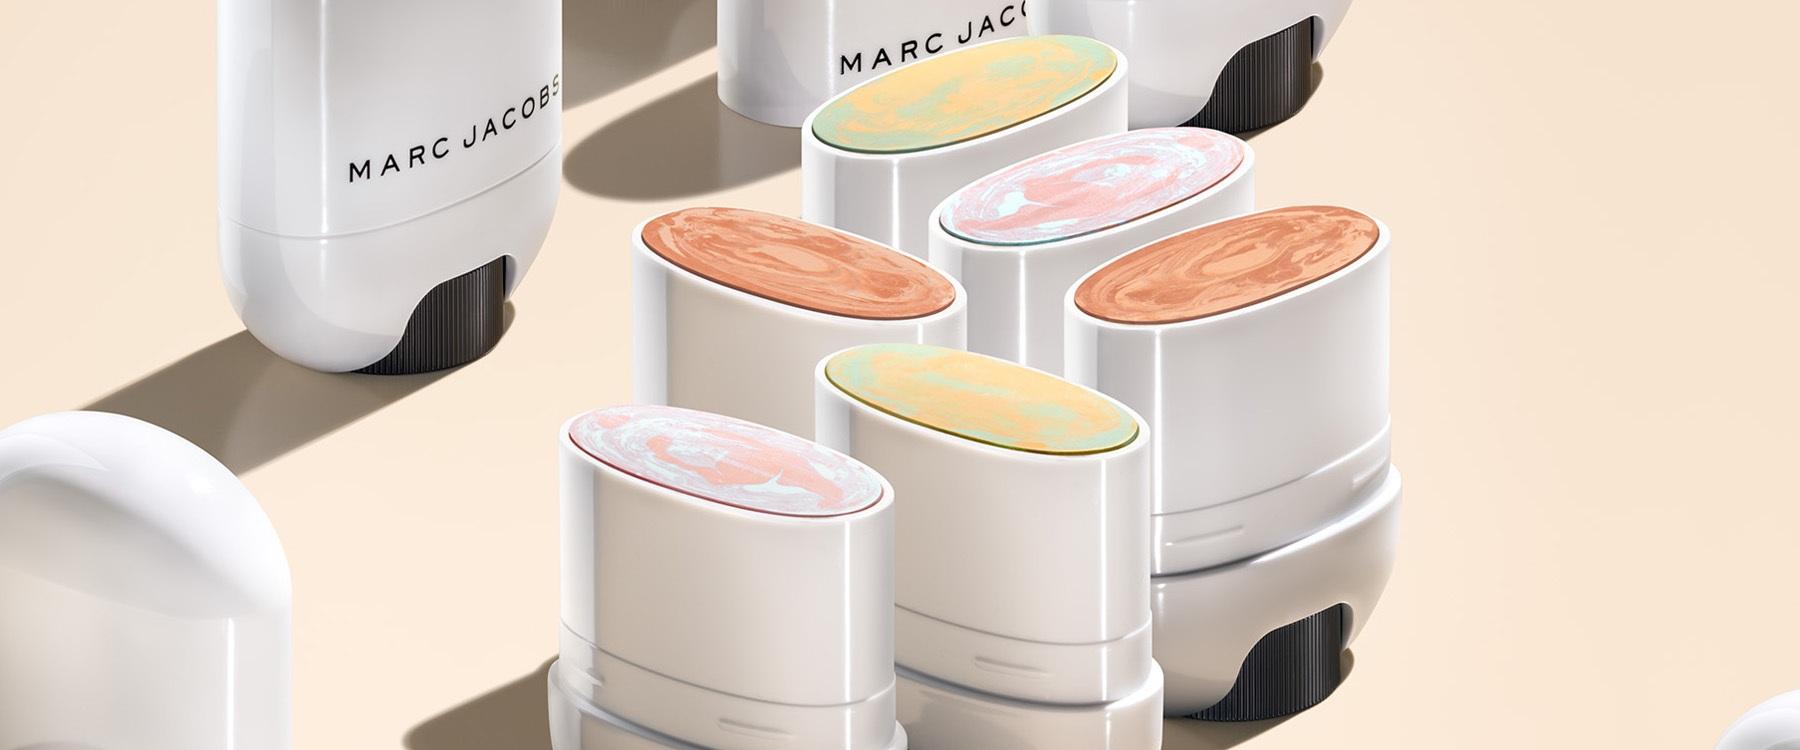 Cover(t) Sticks - Marc Jacobs